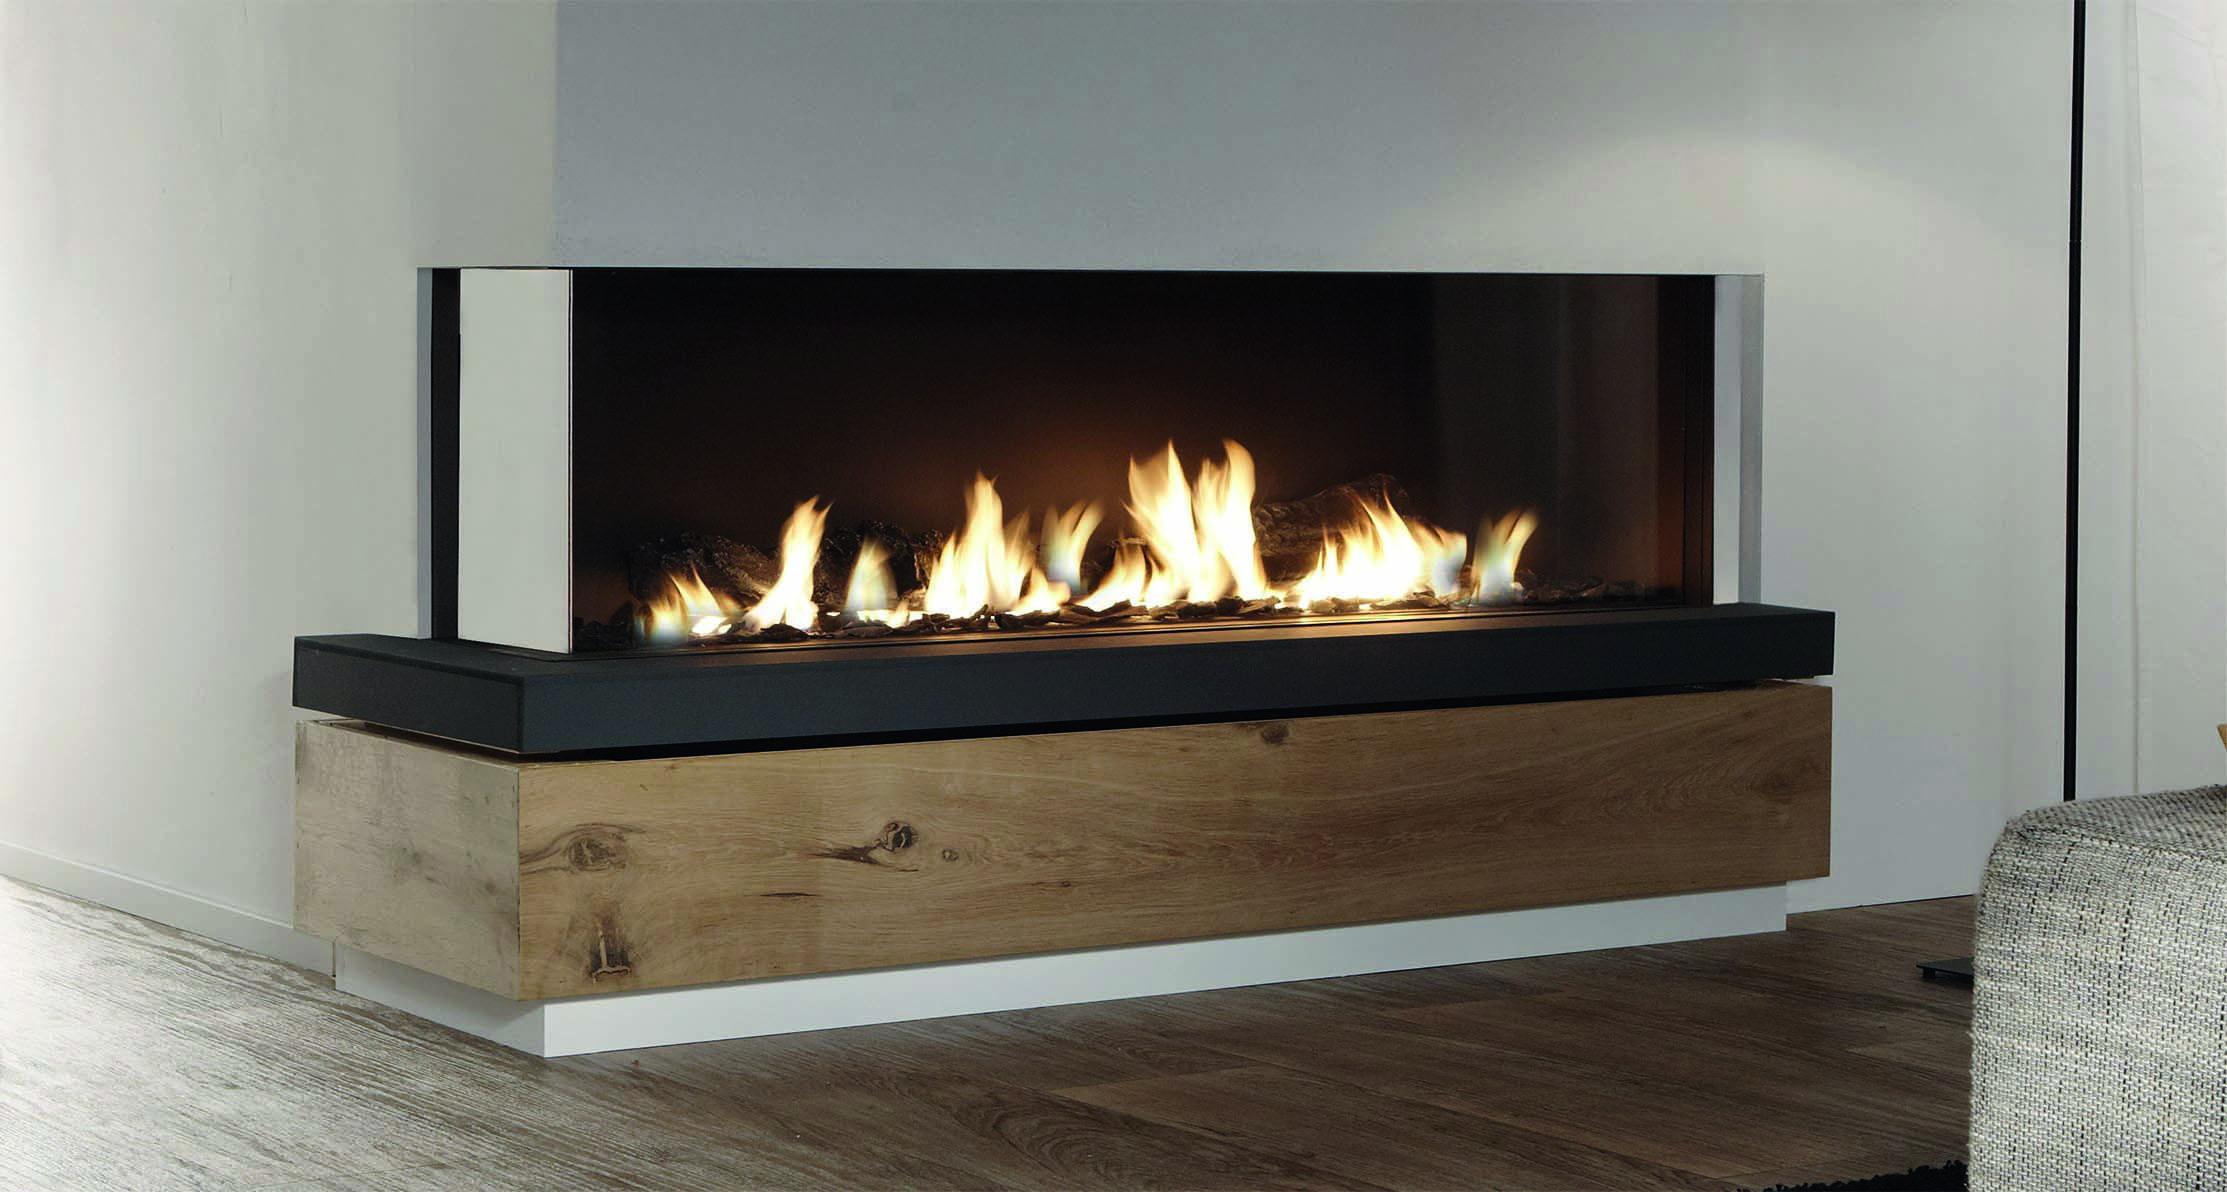 Gaskamin Von Rüegg #Gaskamin #gas Fireplace #fireplace #Heizkamin #Kamin # Ofen